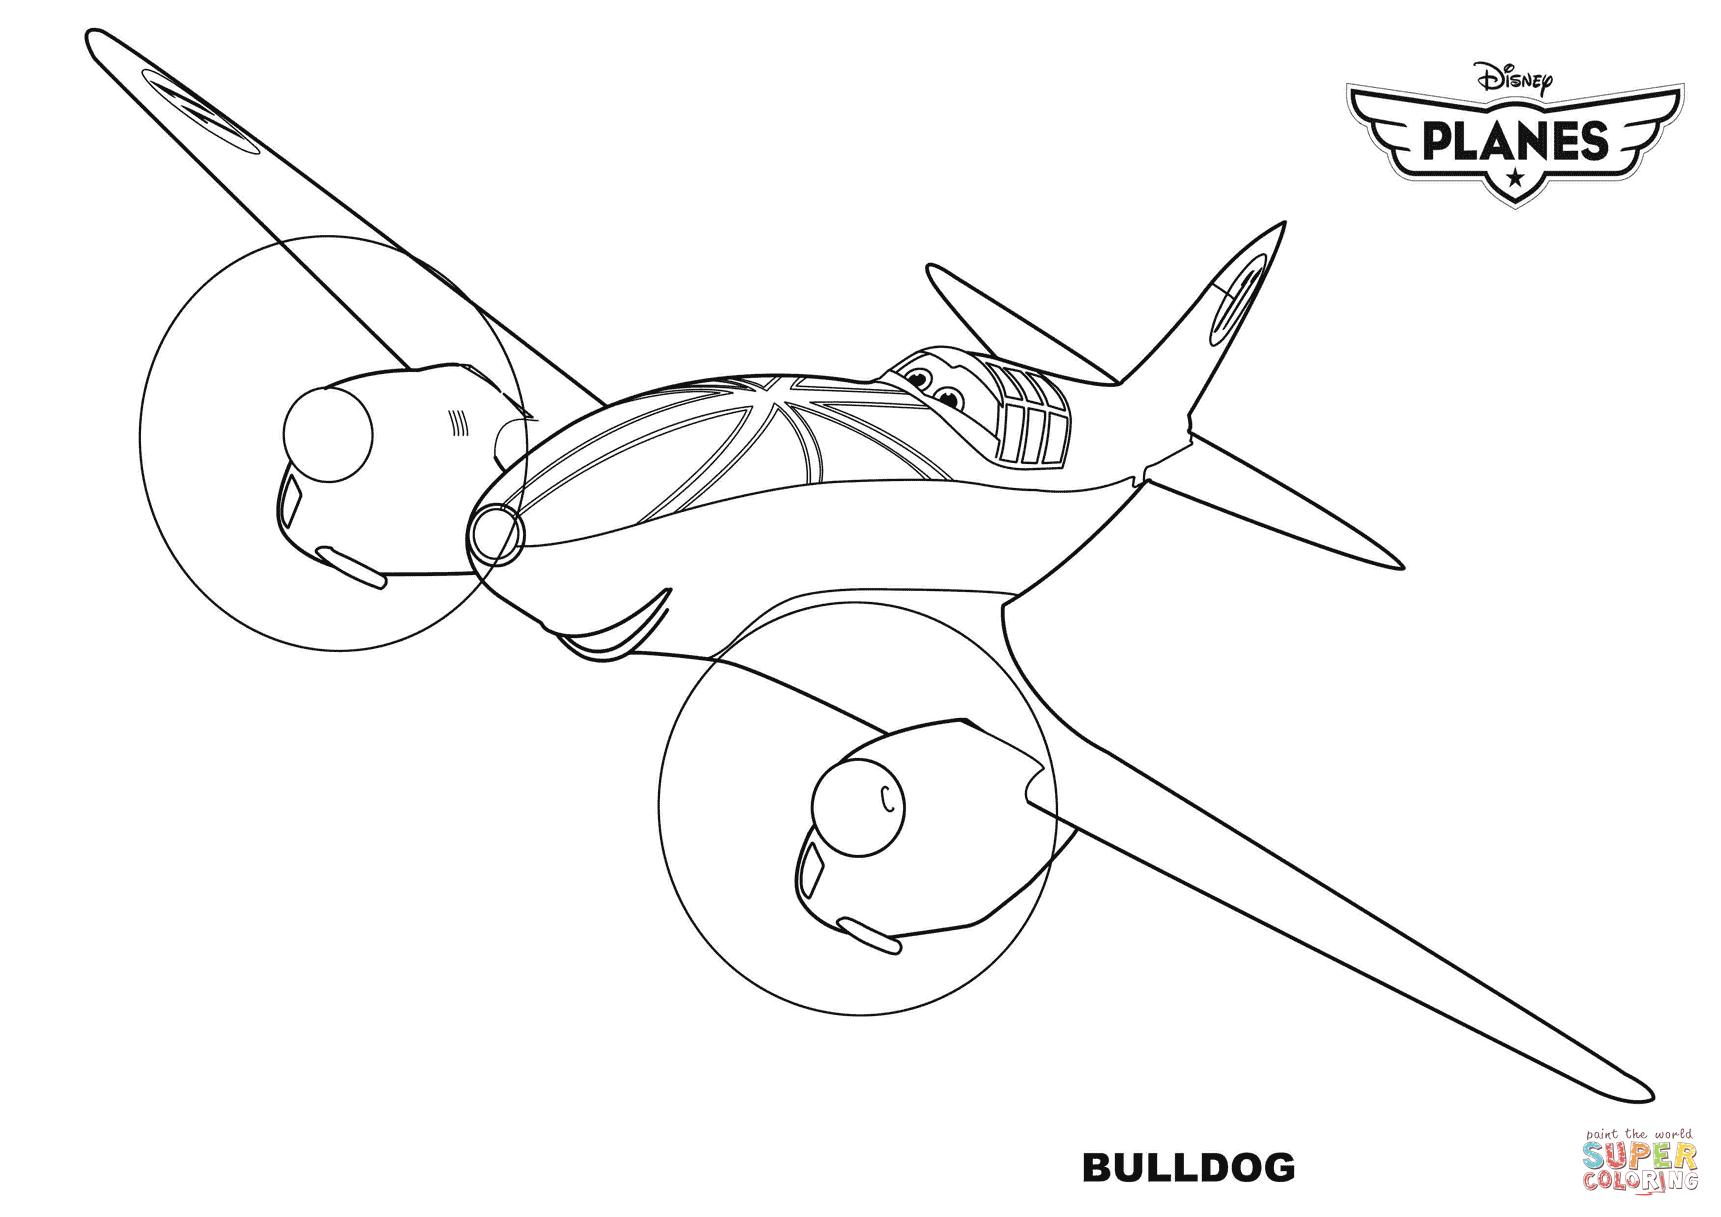 Disney Planes Bulldog Coloring Page Free Printable Coloring Pages